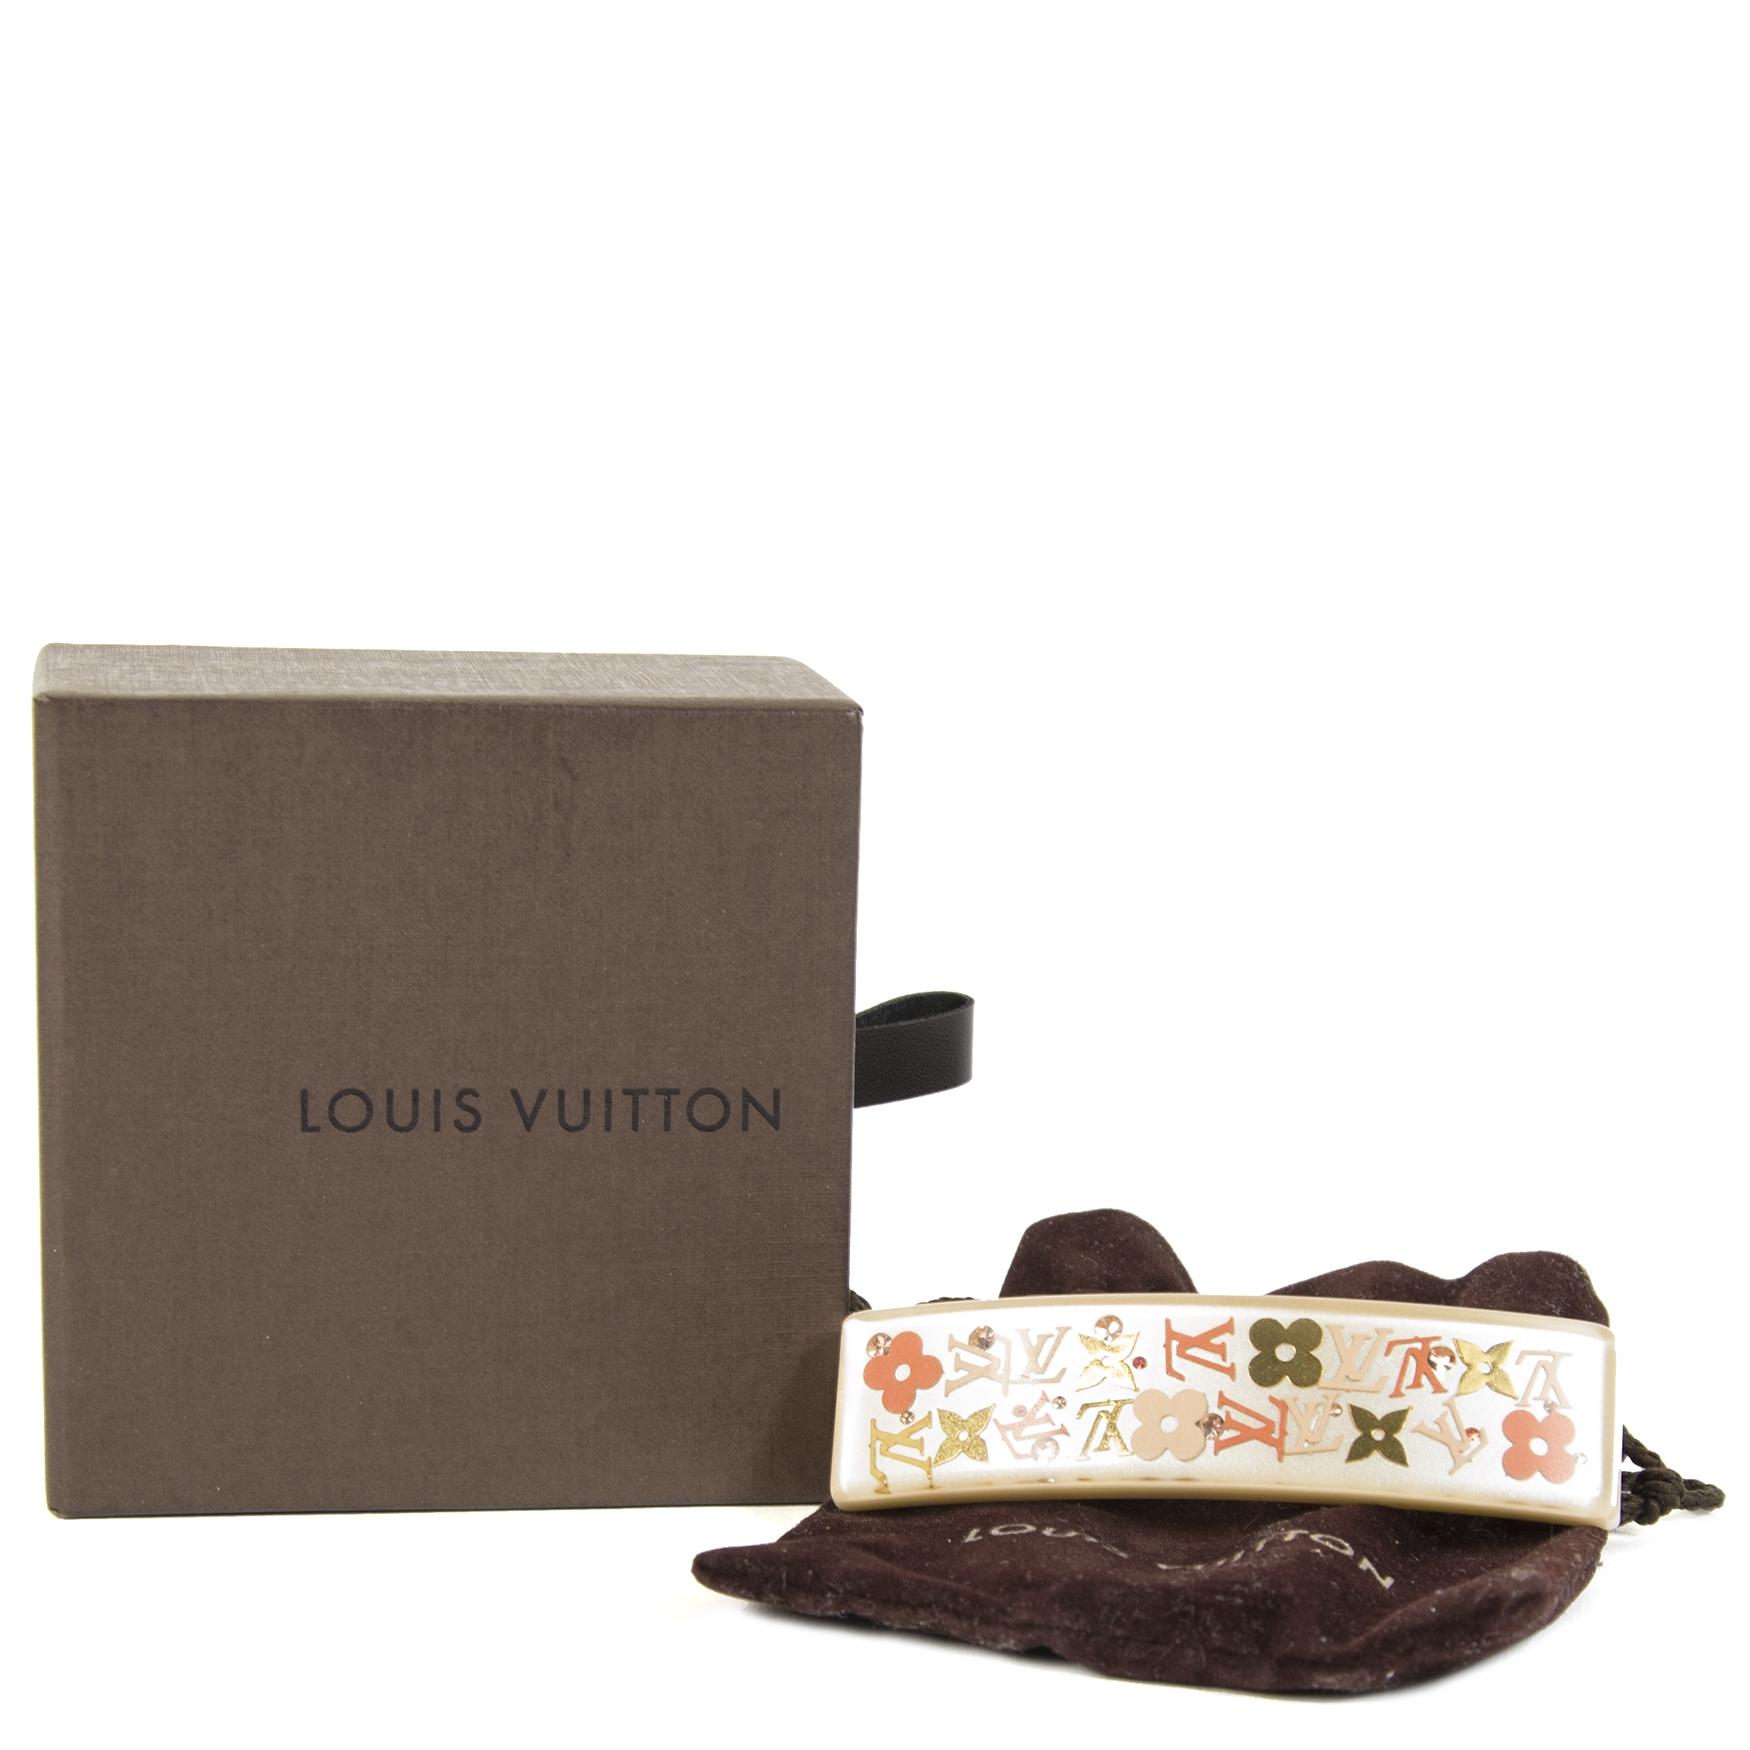 Louis Vuitton Beige Monogram Hairclip